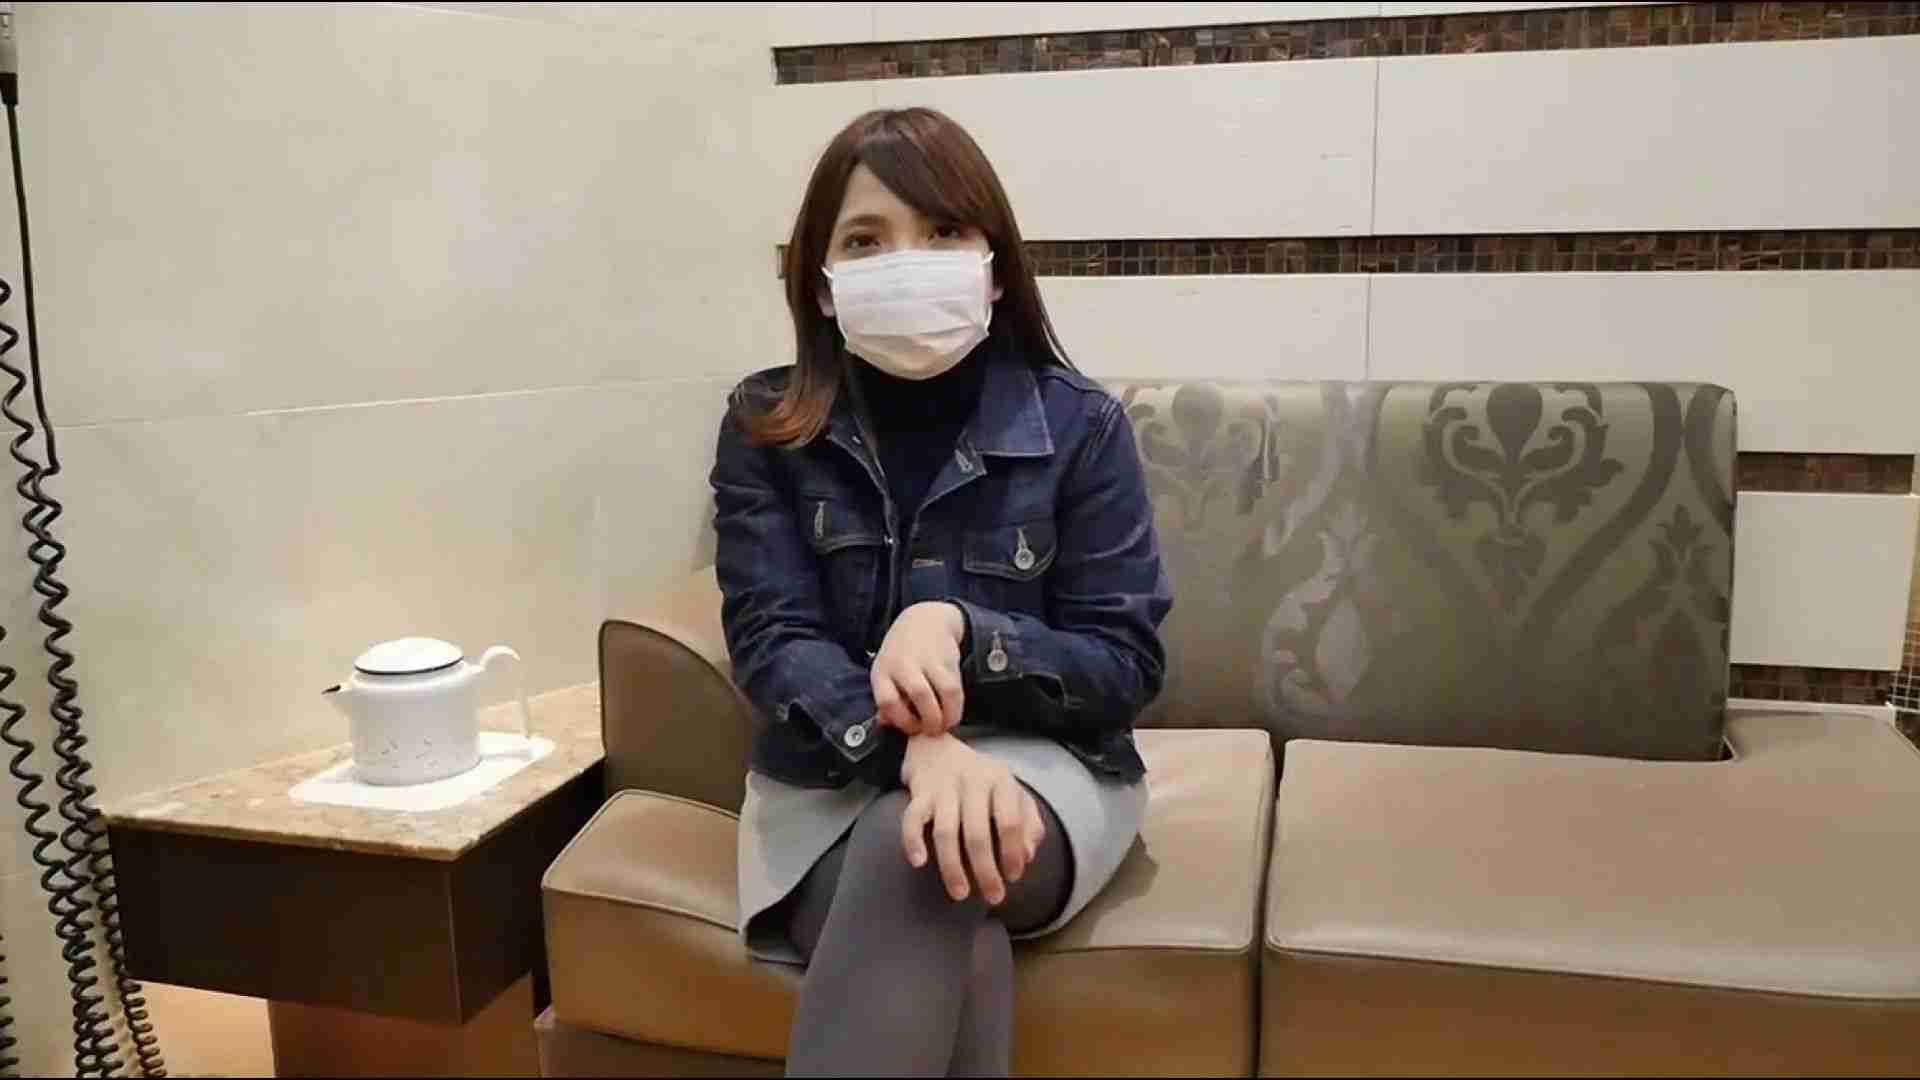 S級厳選美女ビッチガールVol.41 前編 美女  83pic 26